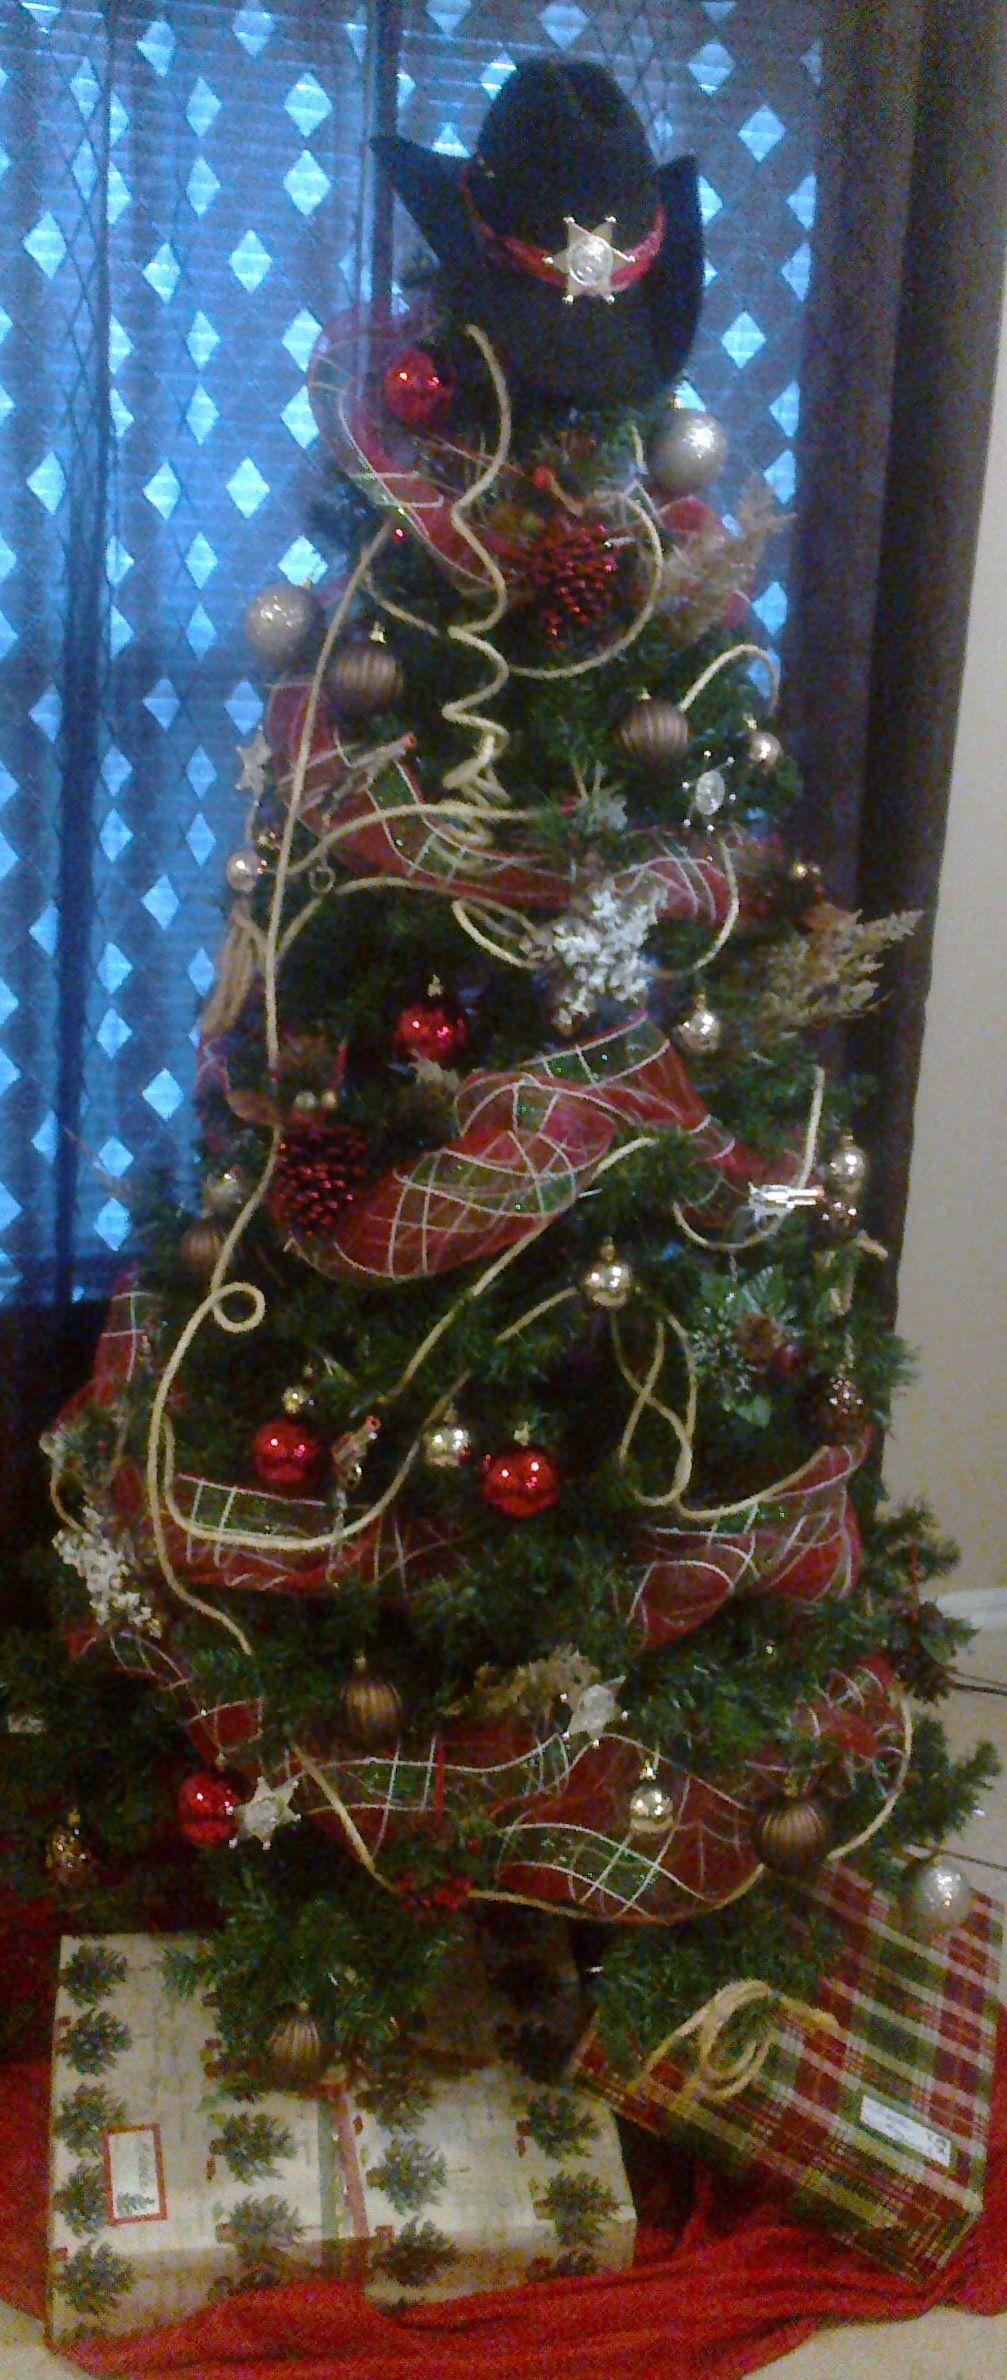 Western Christmas Tree Decorations.Cowboy Christmas Tree Cowboy Cowgirl Christmas Country